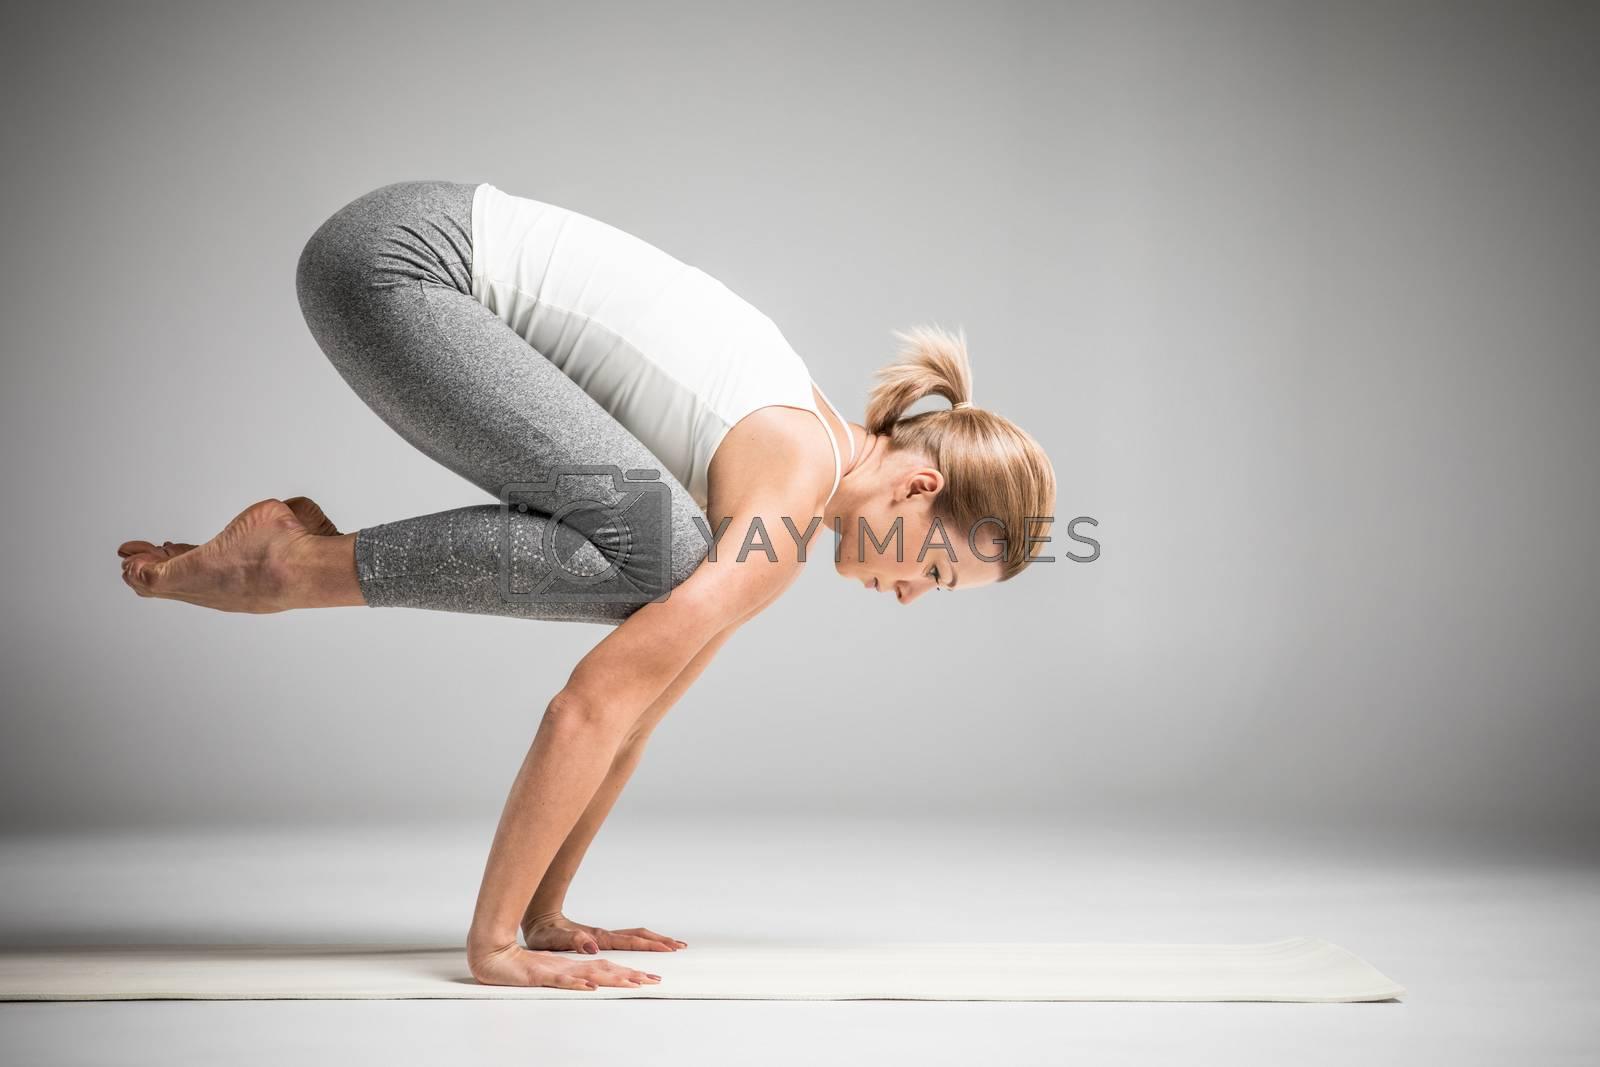 Woman practicing yoga standing in Bakasana or Crane position